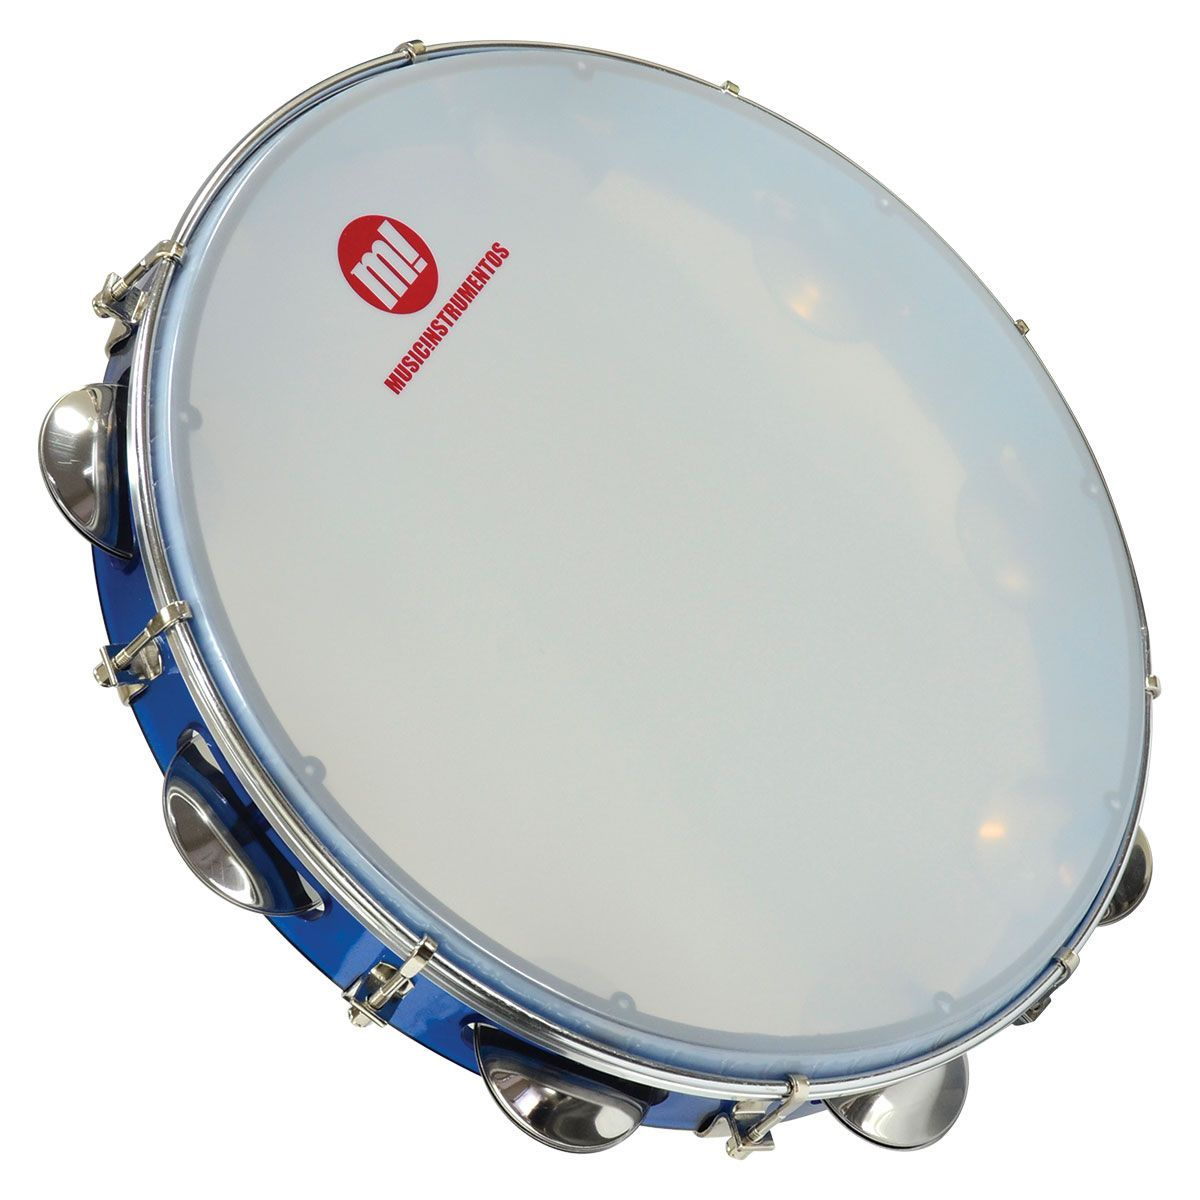 Pandeiro Acrílico Phx Music 10 Pele Leitosa Azul